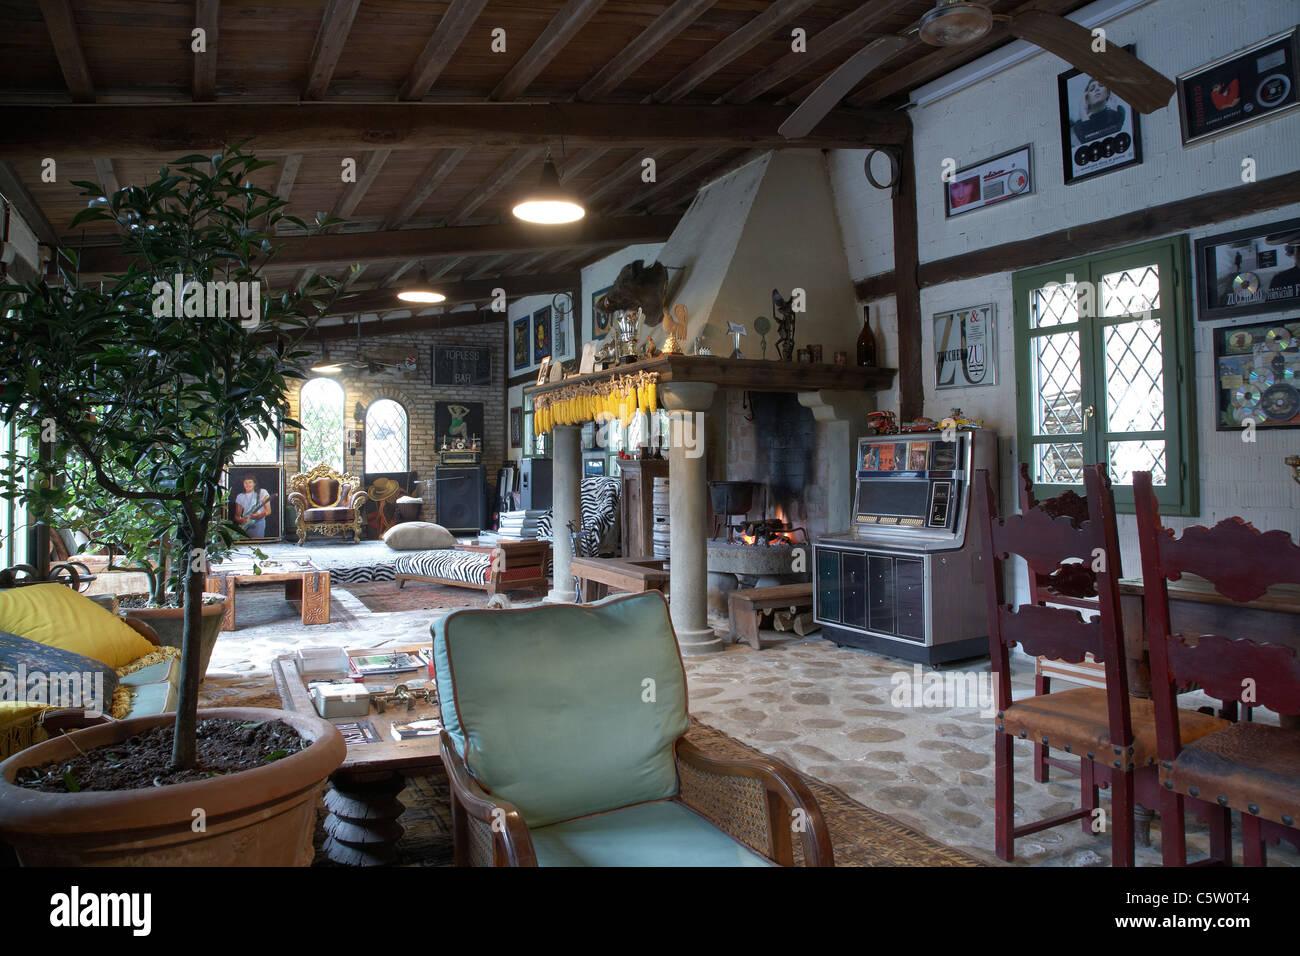 Classic Italian Home Decorating Youtube Photos Of Tuscany In Italy - Italian home interior design